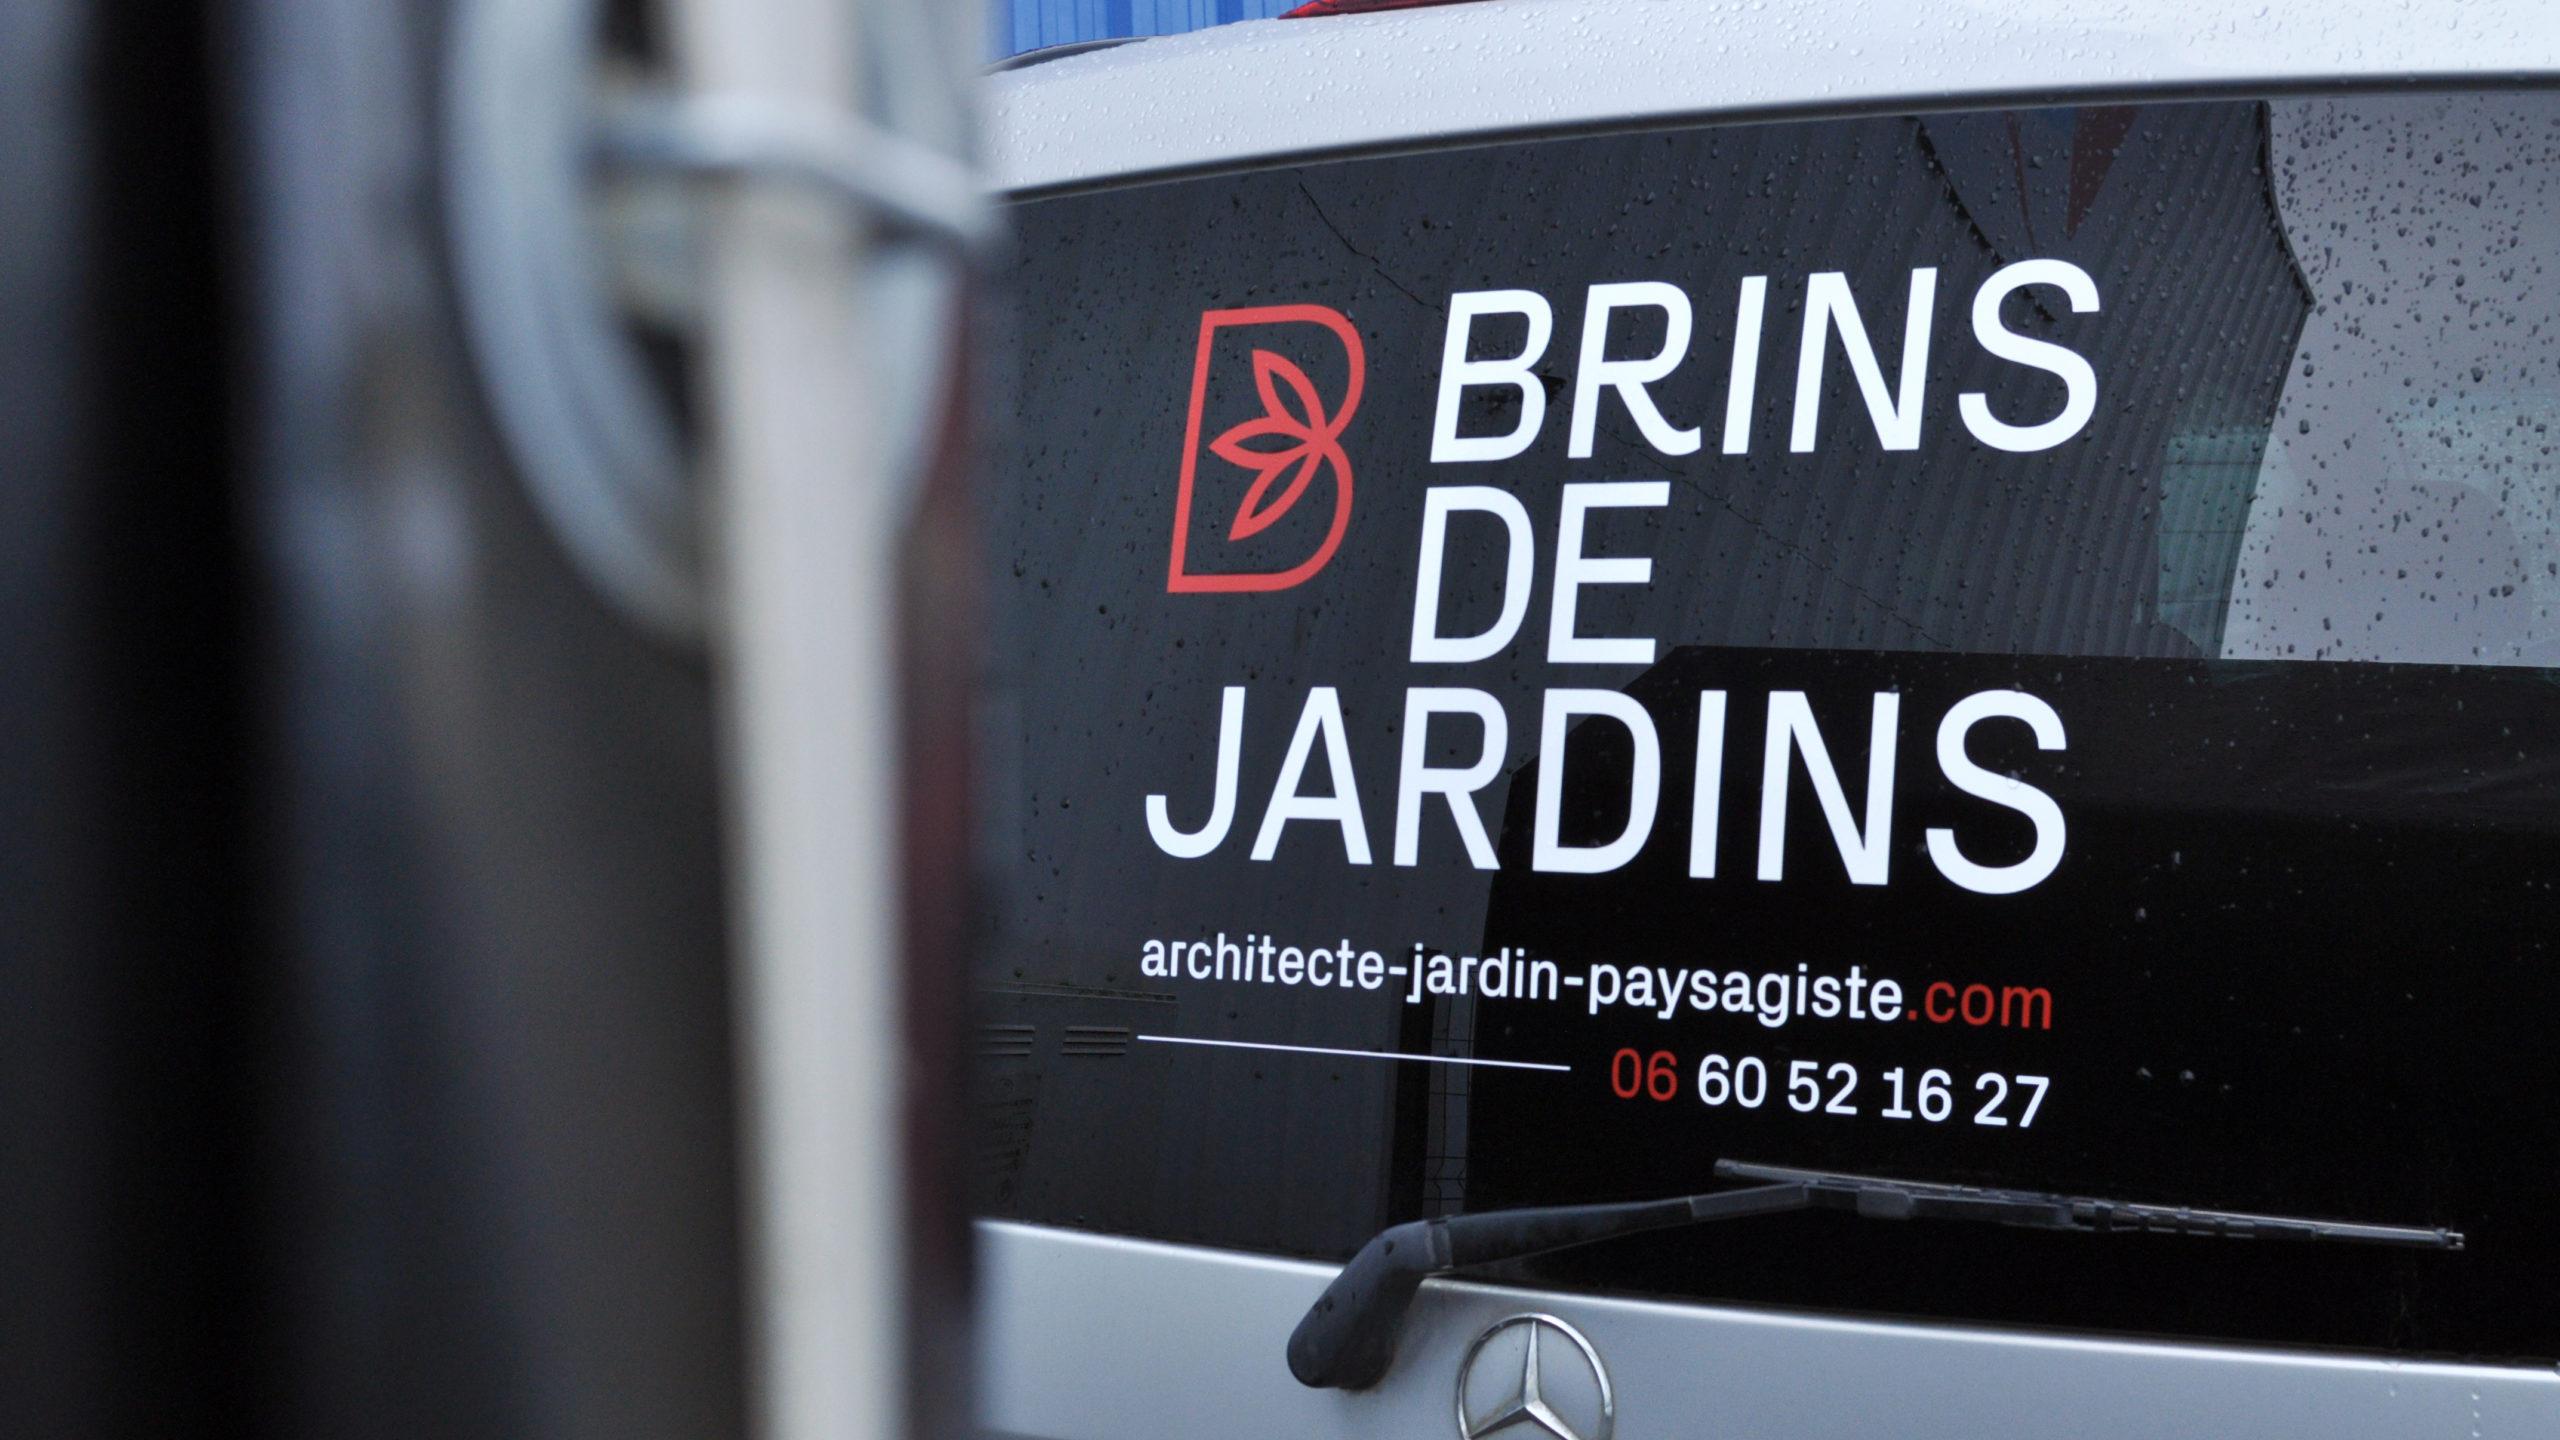 Briens Architecte Paysagiste Identite Visuelle Logotype Signaletique Vehicule Scaled